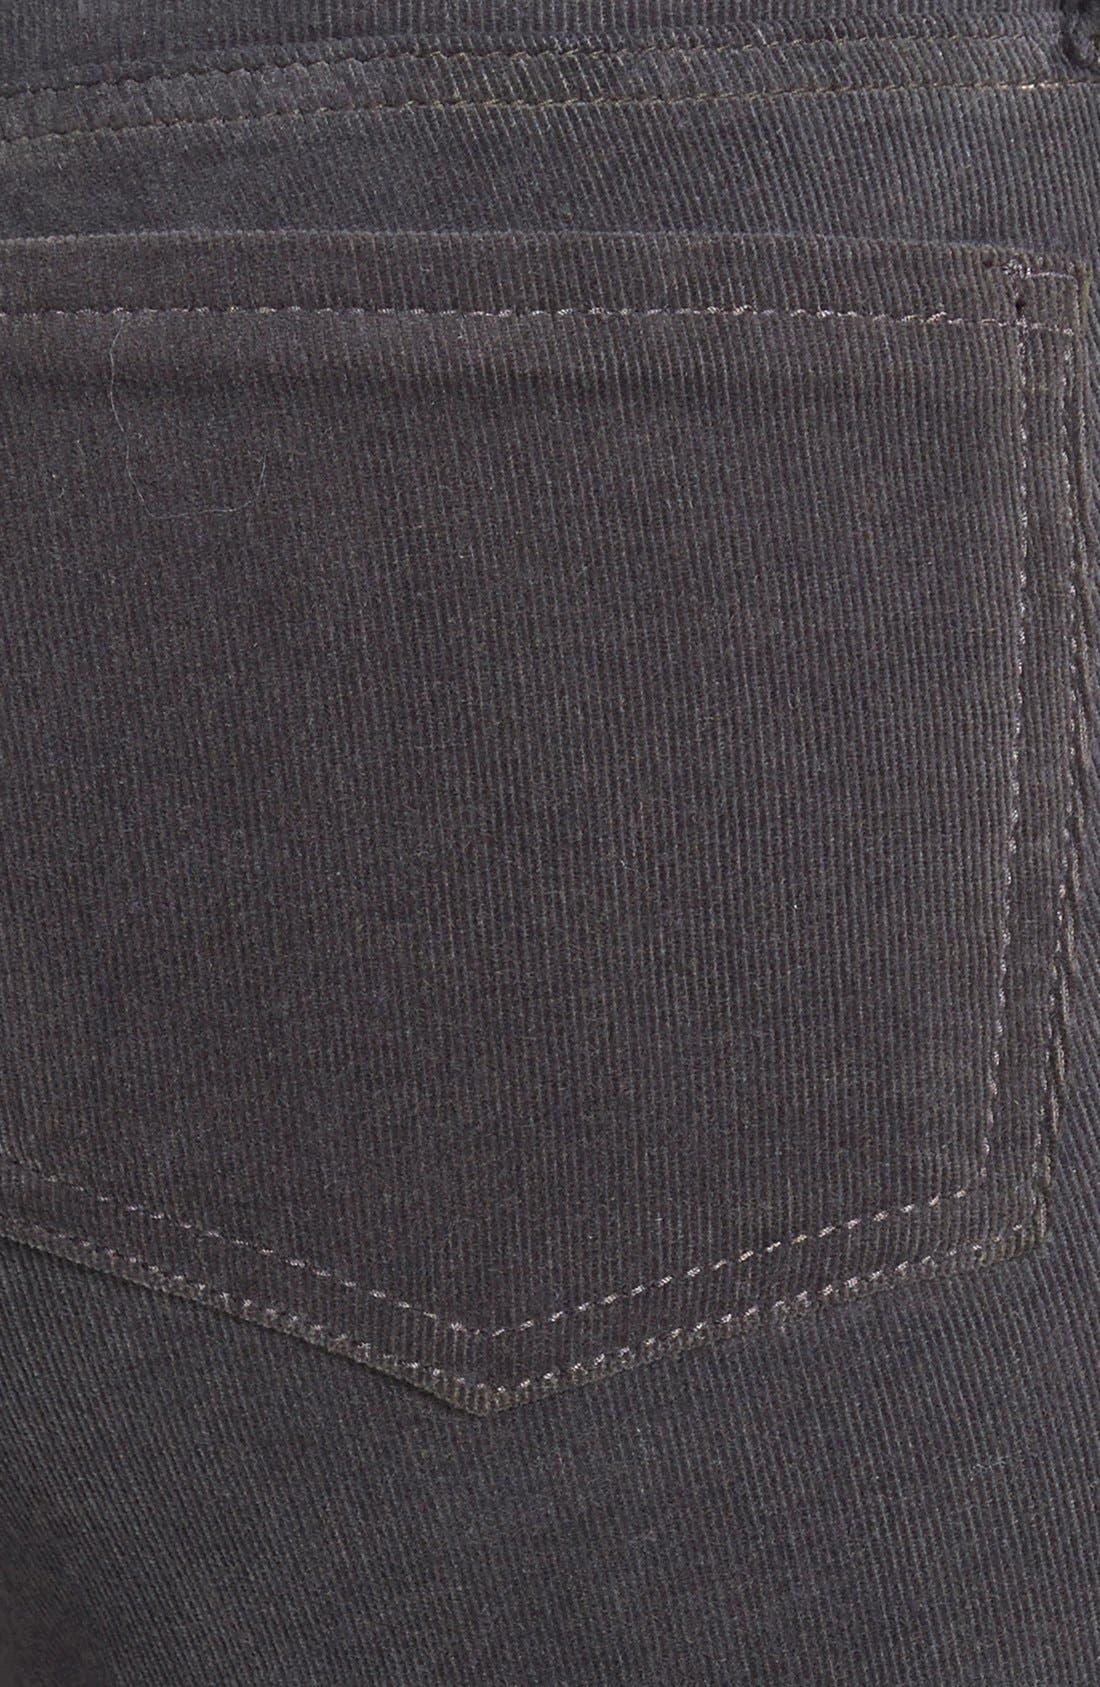 'Diana' Stretch Corduroy Skinny Pants,                             Alternate thumbnail 210, color,